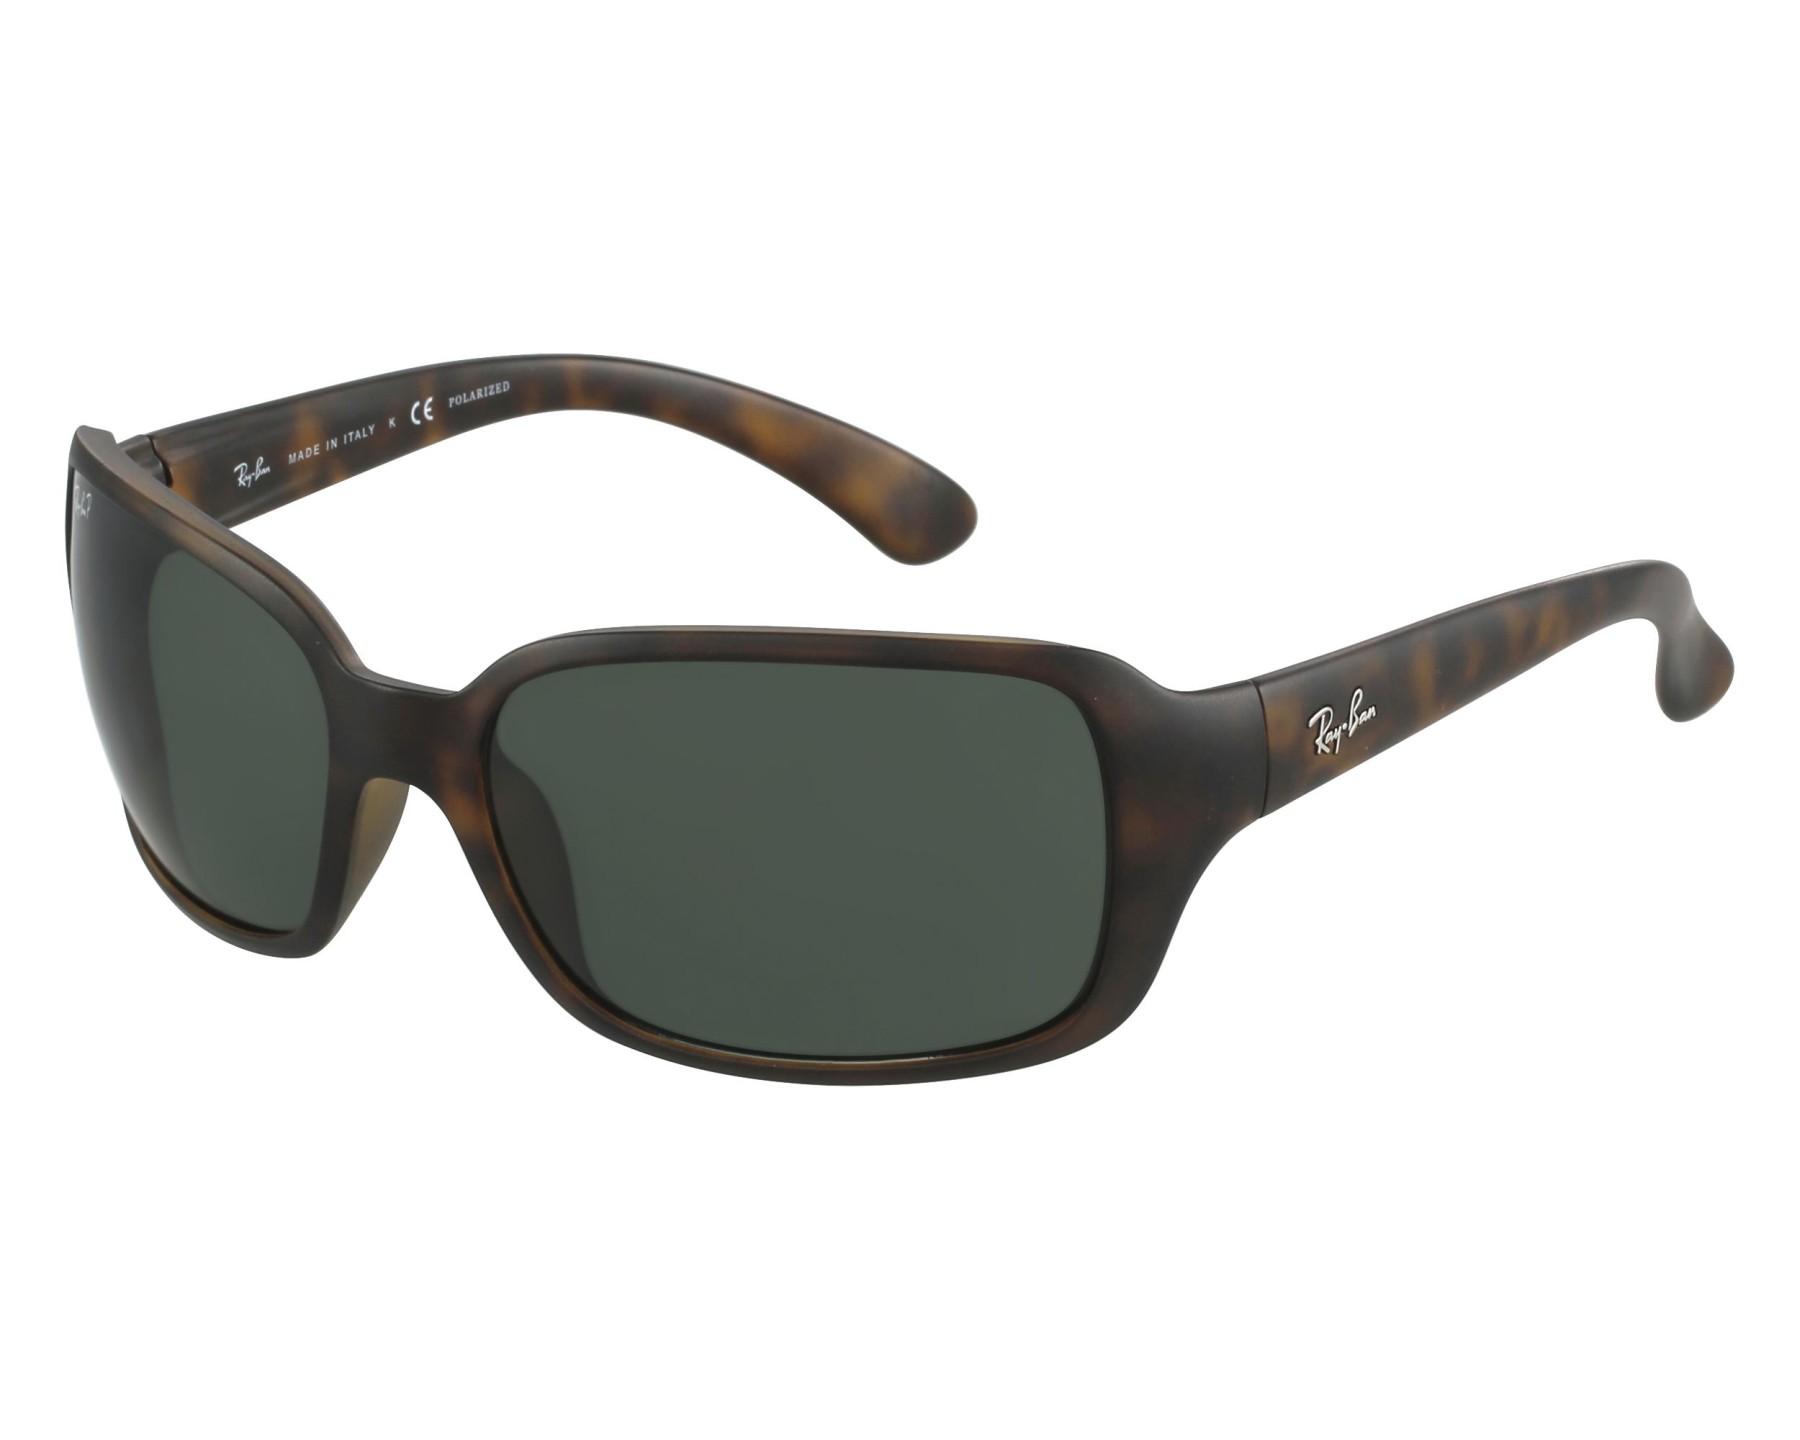 Ray-Ban Sunglasses RB-4227 6192/13